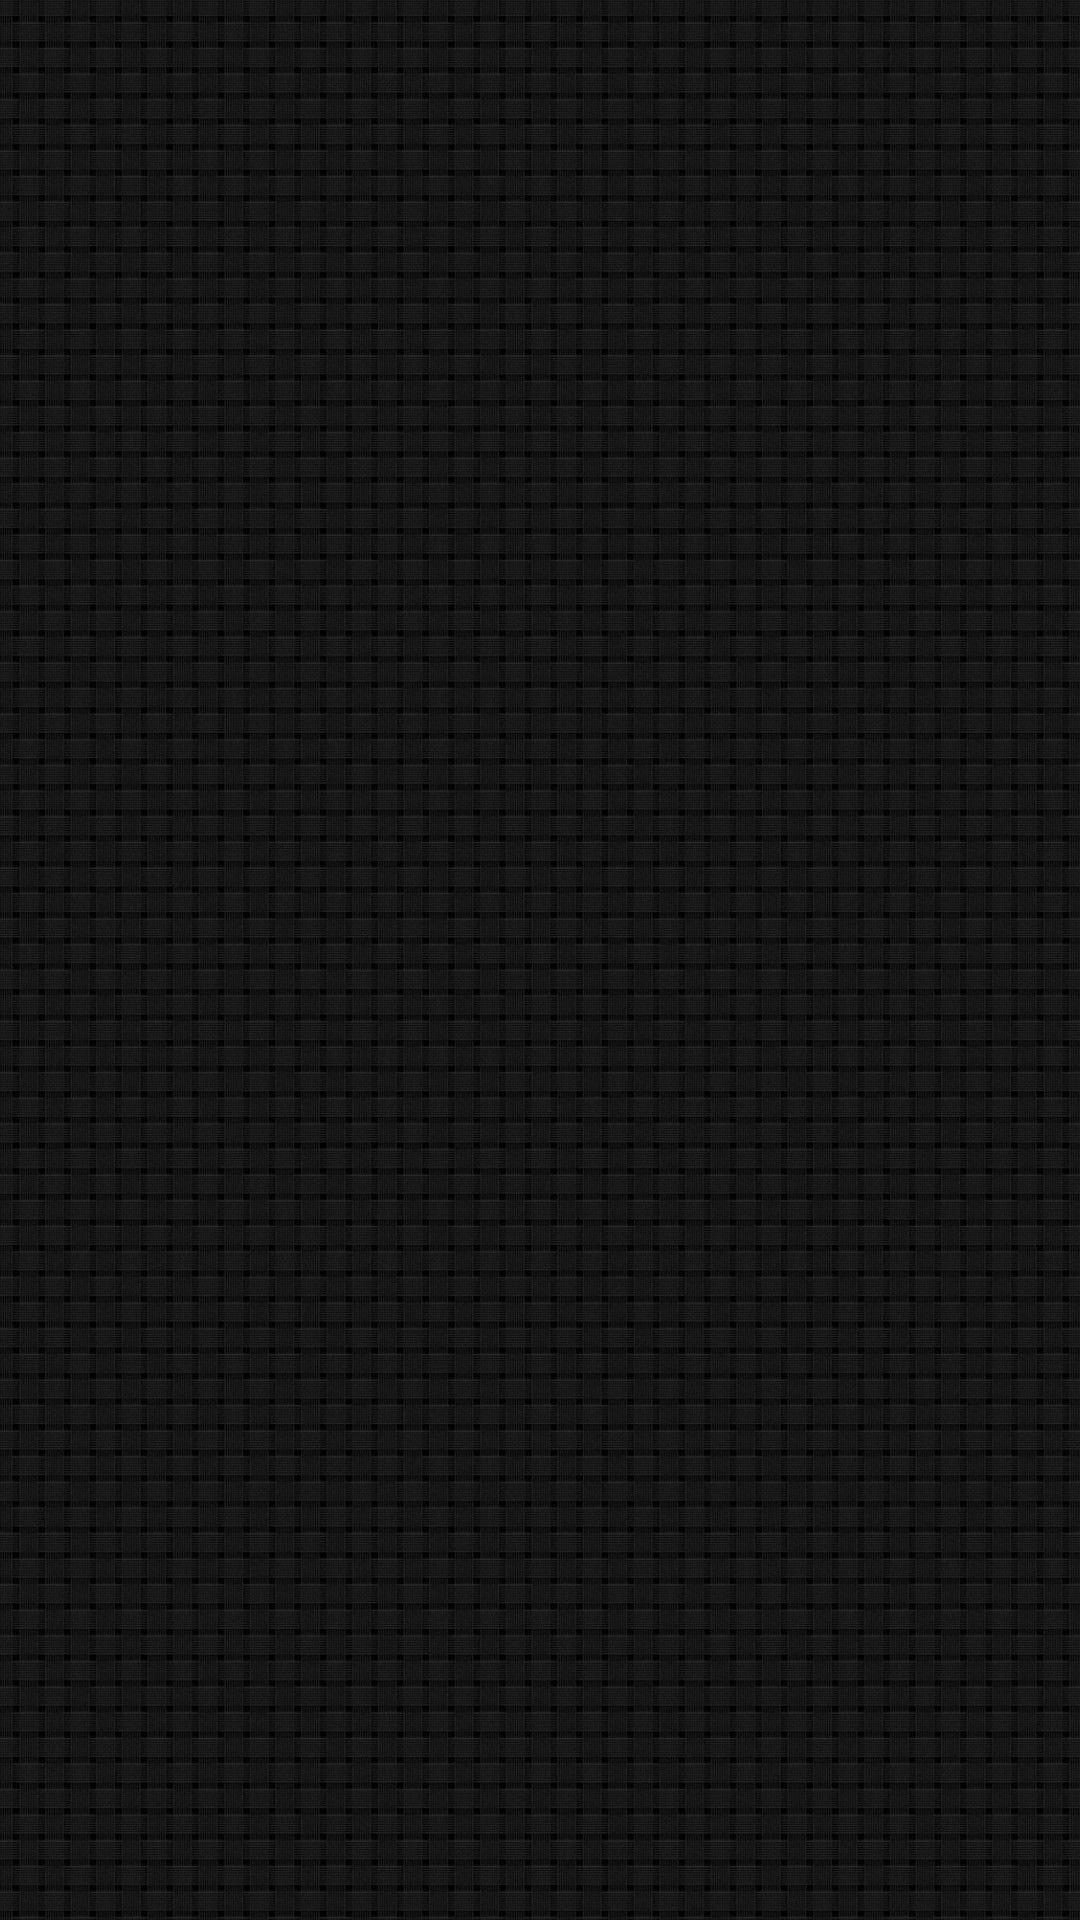 14 Download Pure Black Wallpaper For Galaxy S5 Paling Keren Pure Black Wallpaper Black Wallpaper Samsung Wallpaper